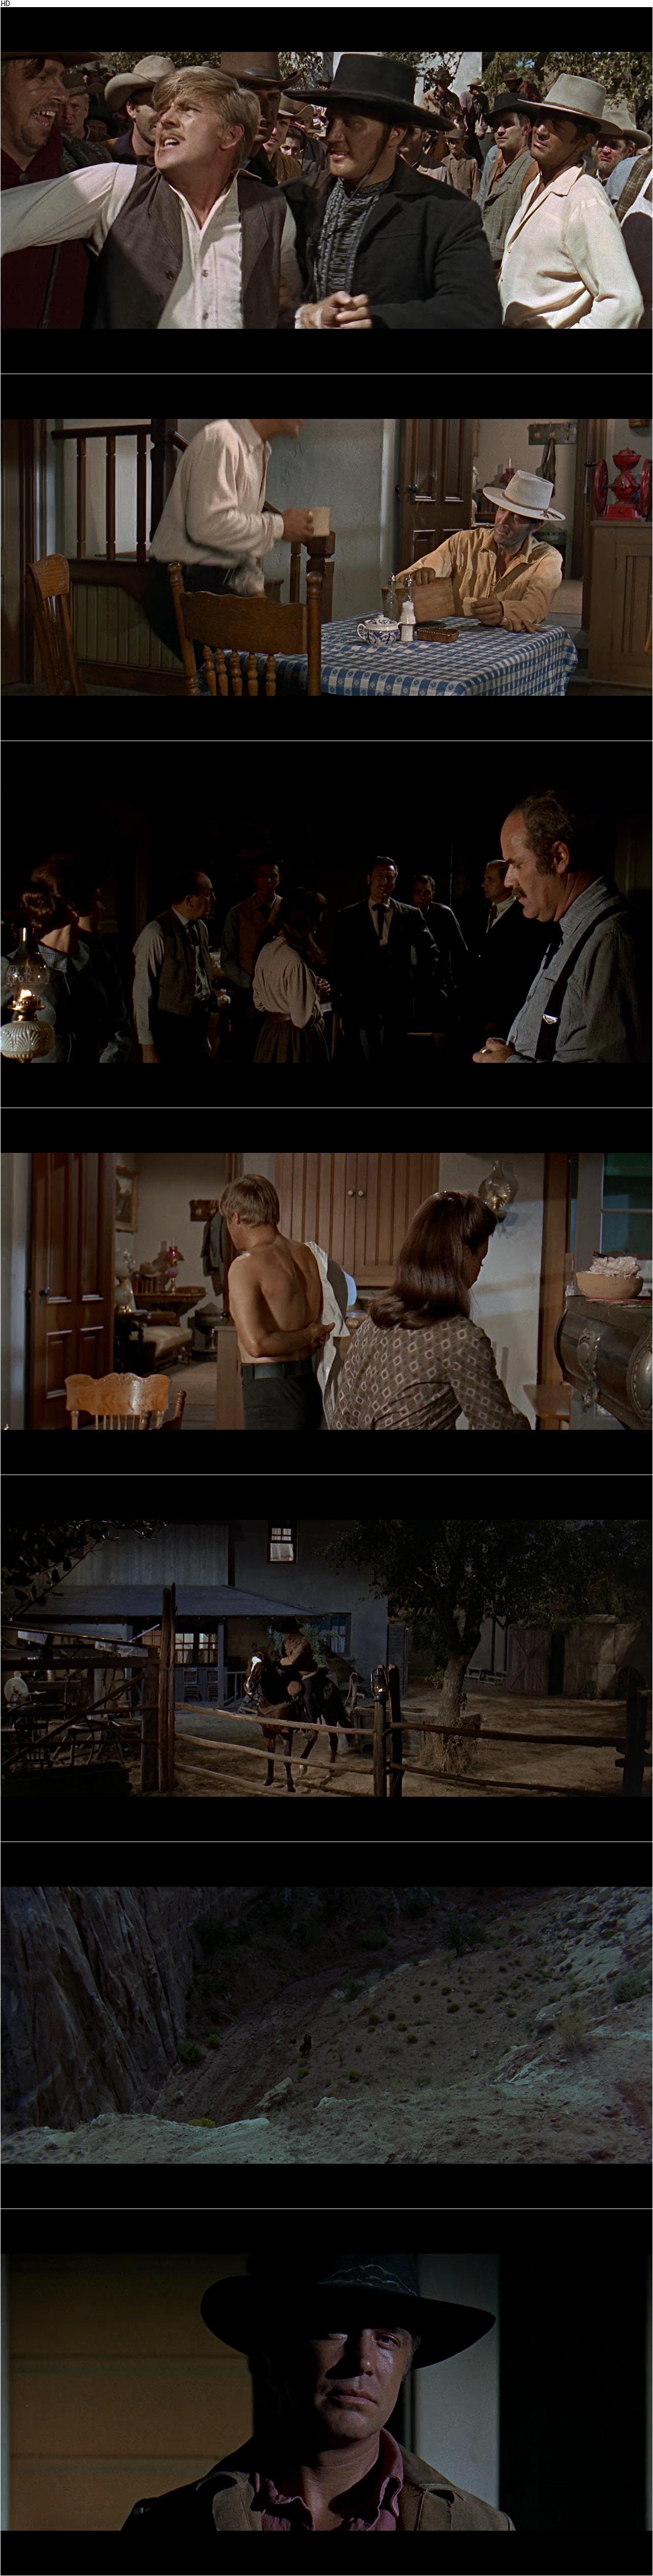 Rough Night in Jericho (1967)